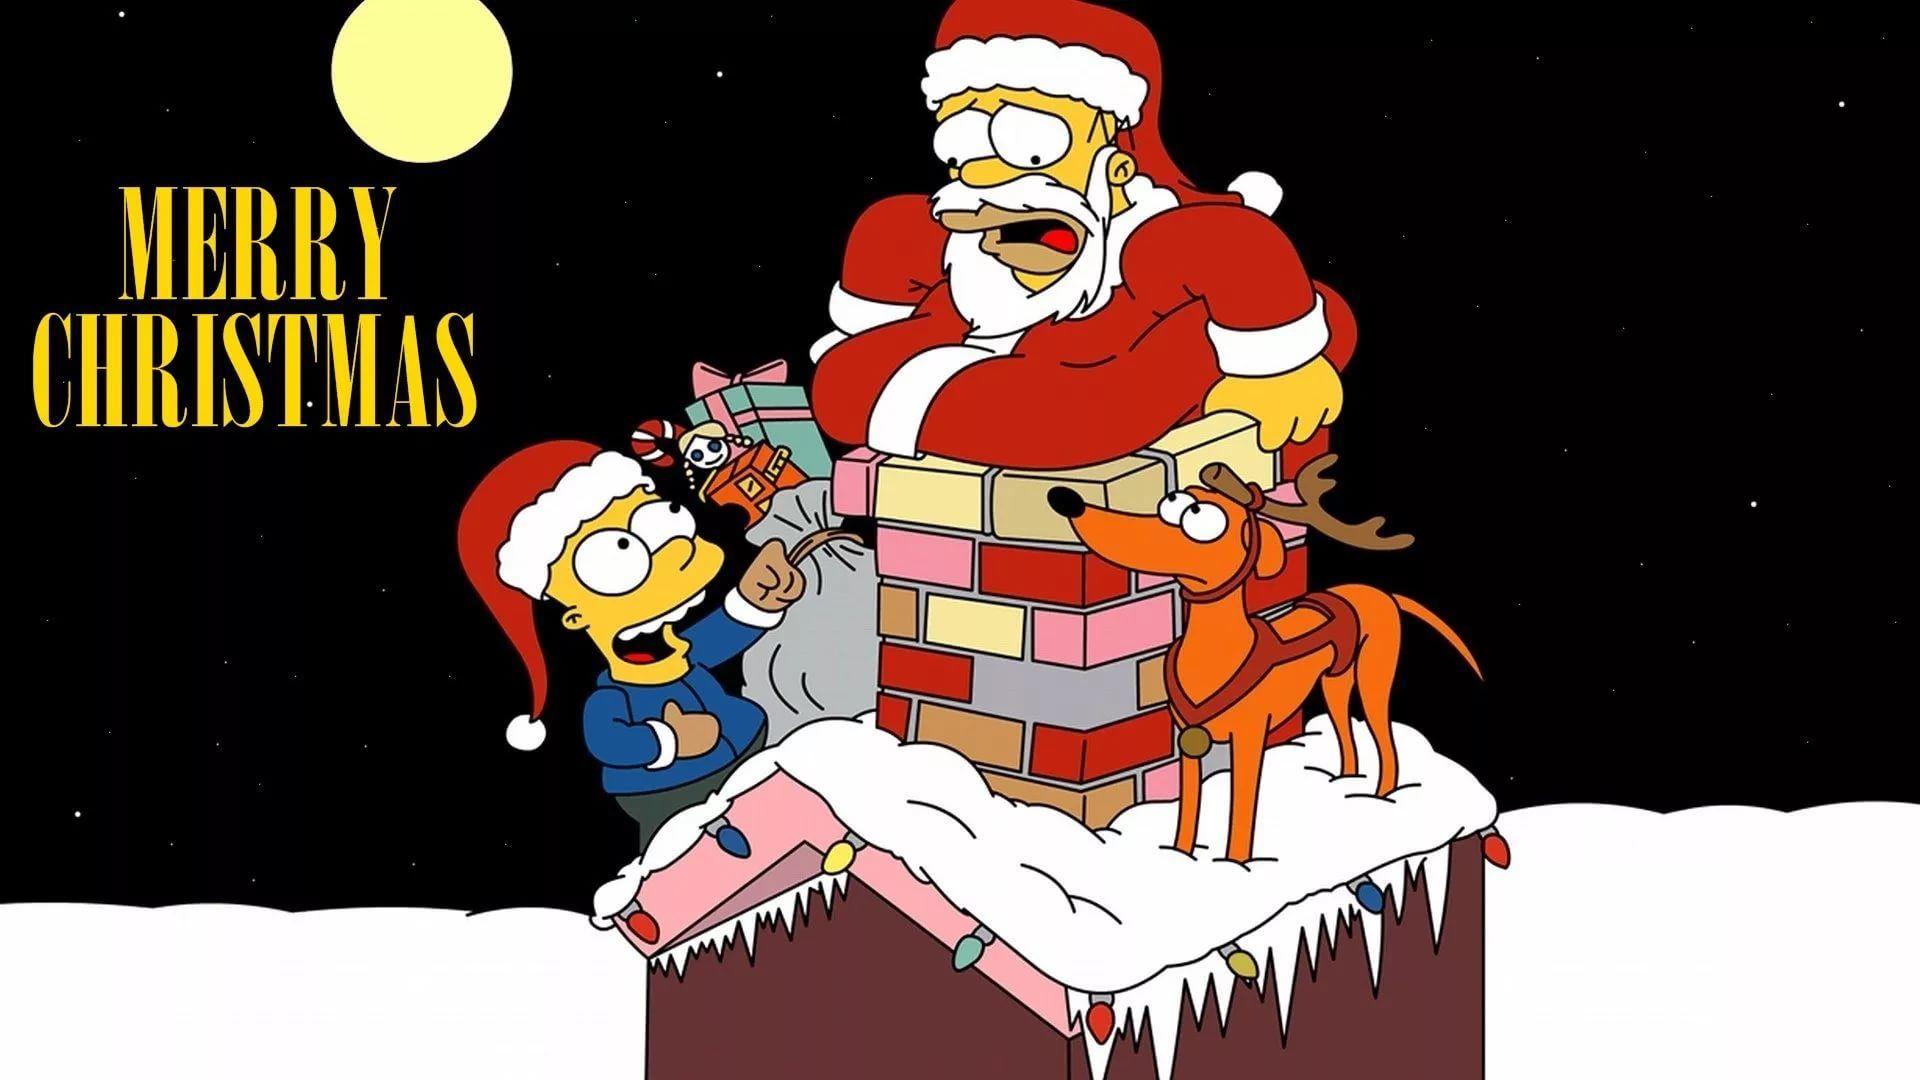 Funny Christmas PC Wallpaper HD